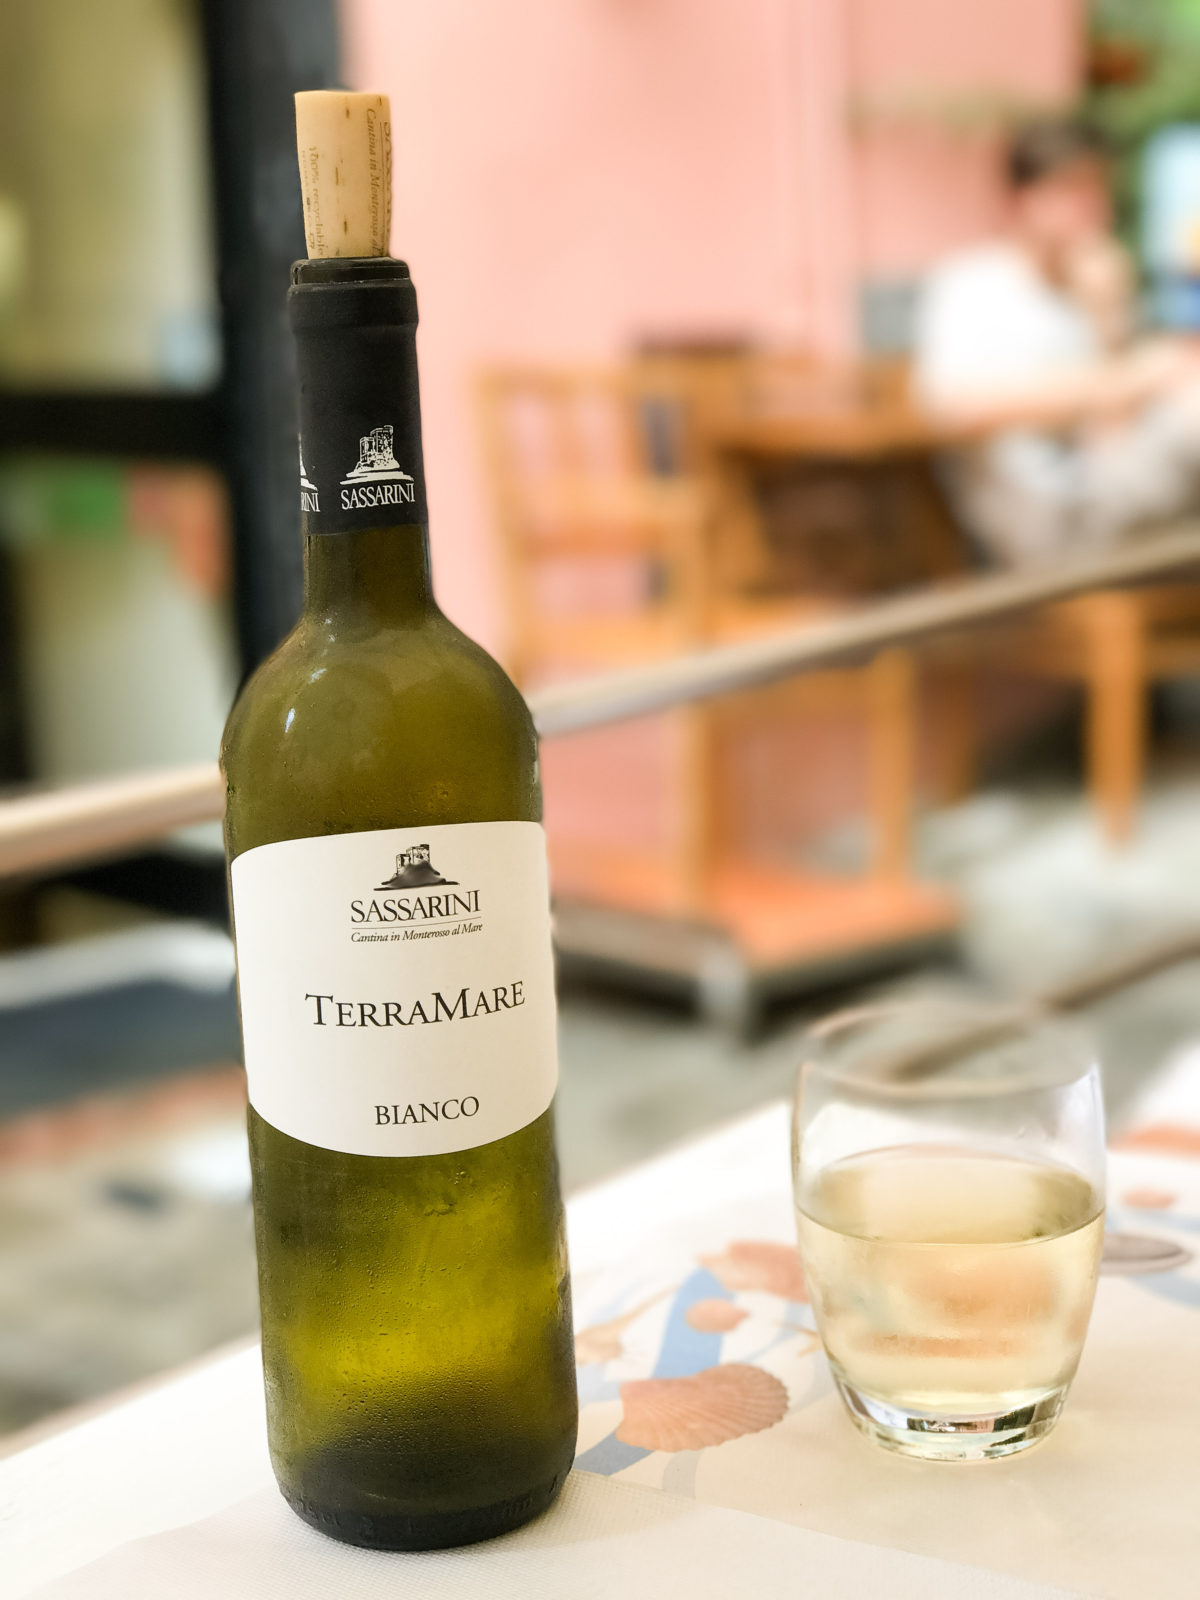 Tuscany Cinque Terre Monterosso restaurant, Italy Travel Guide